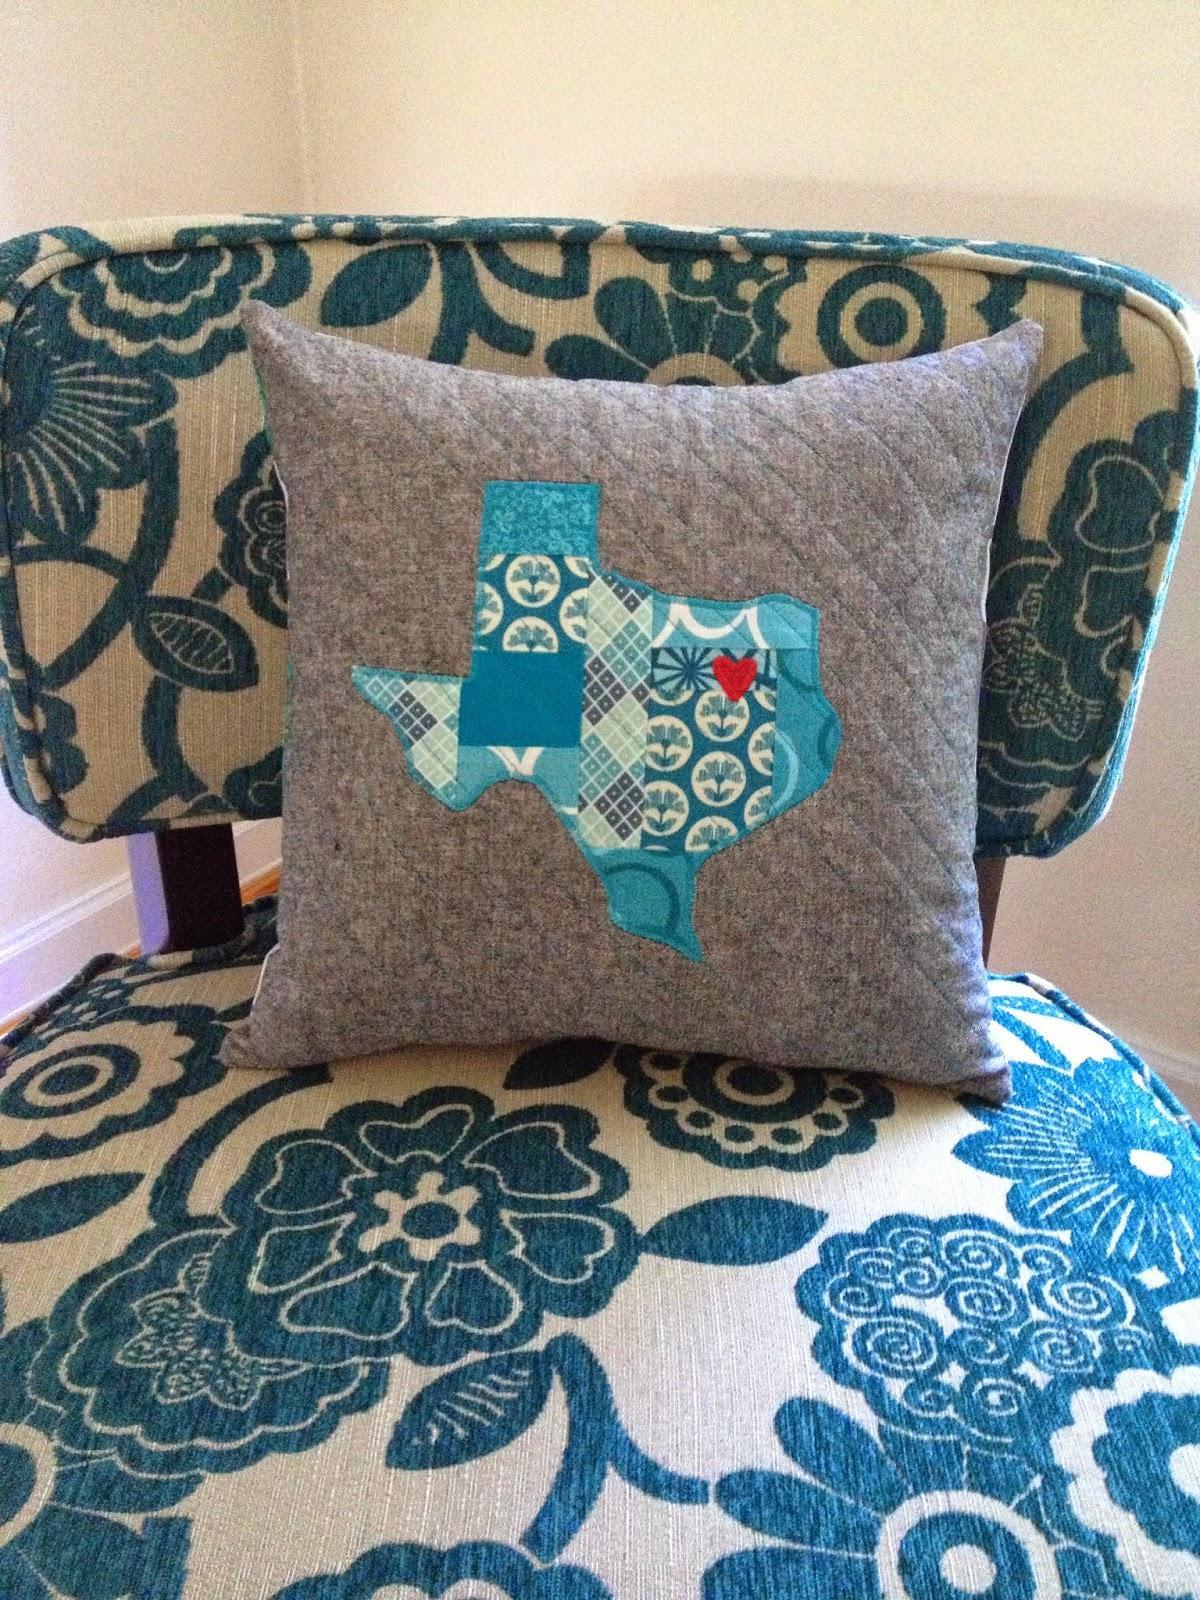 http://ablueskykindoflife.blogspot.com/2014/07/pillow-texas-love.html